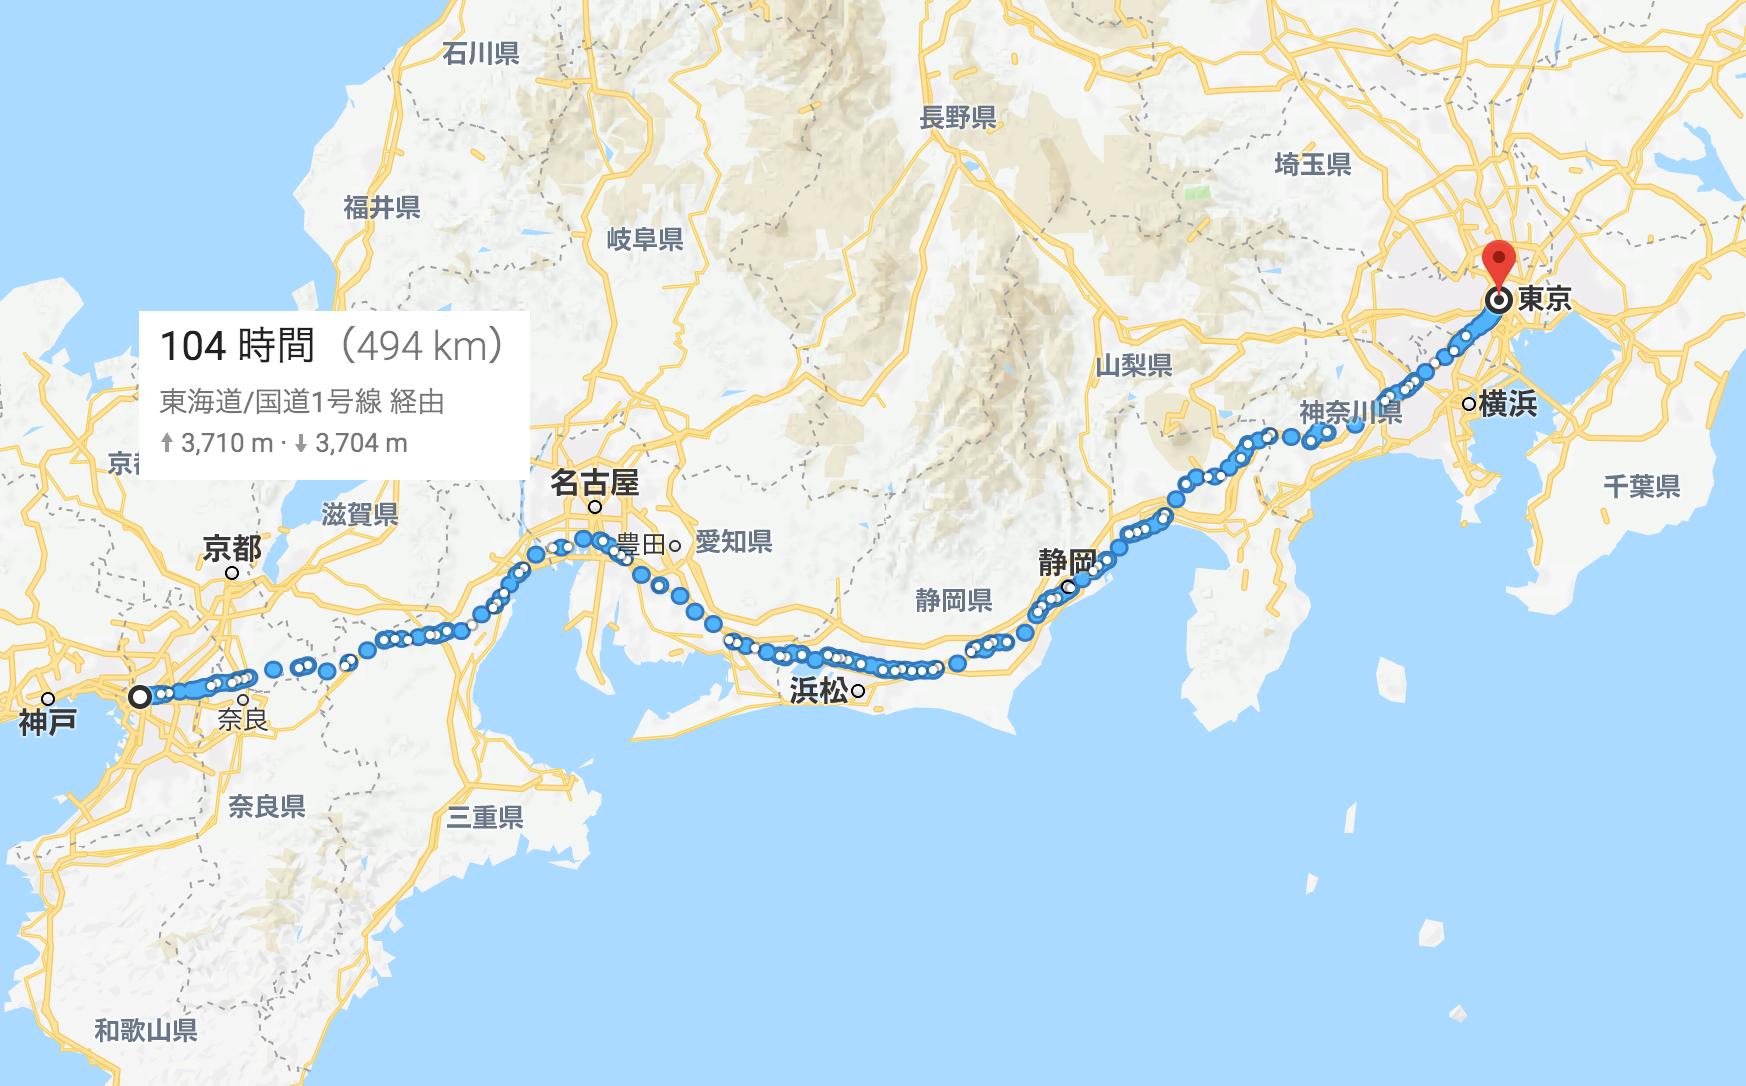 f:id:atsuhiro-me:20180228020501p:plain:w300